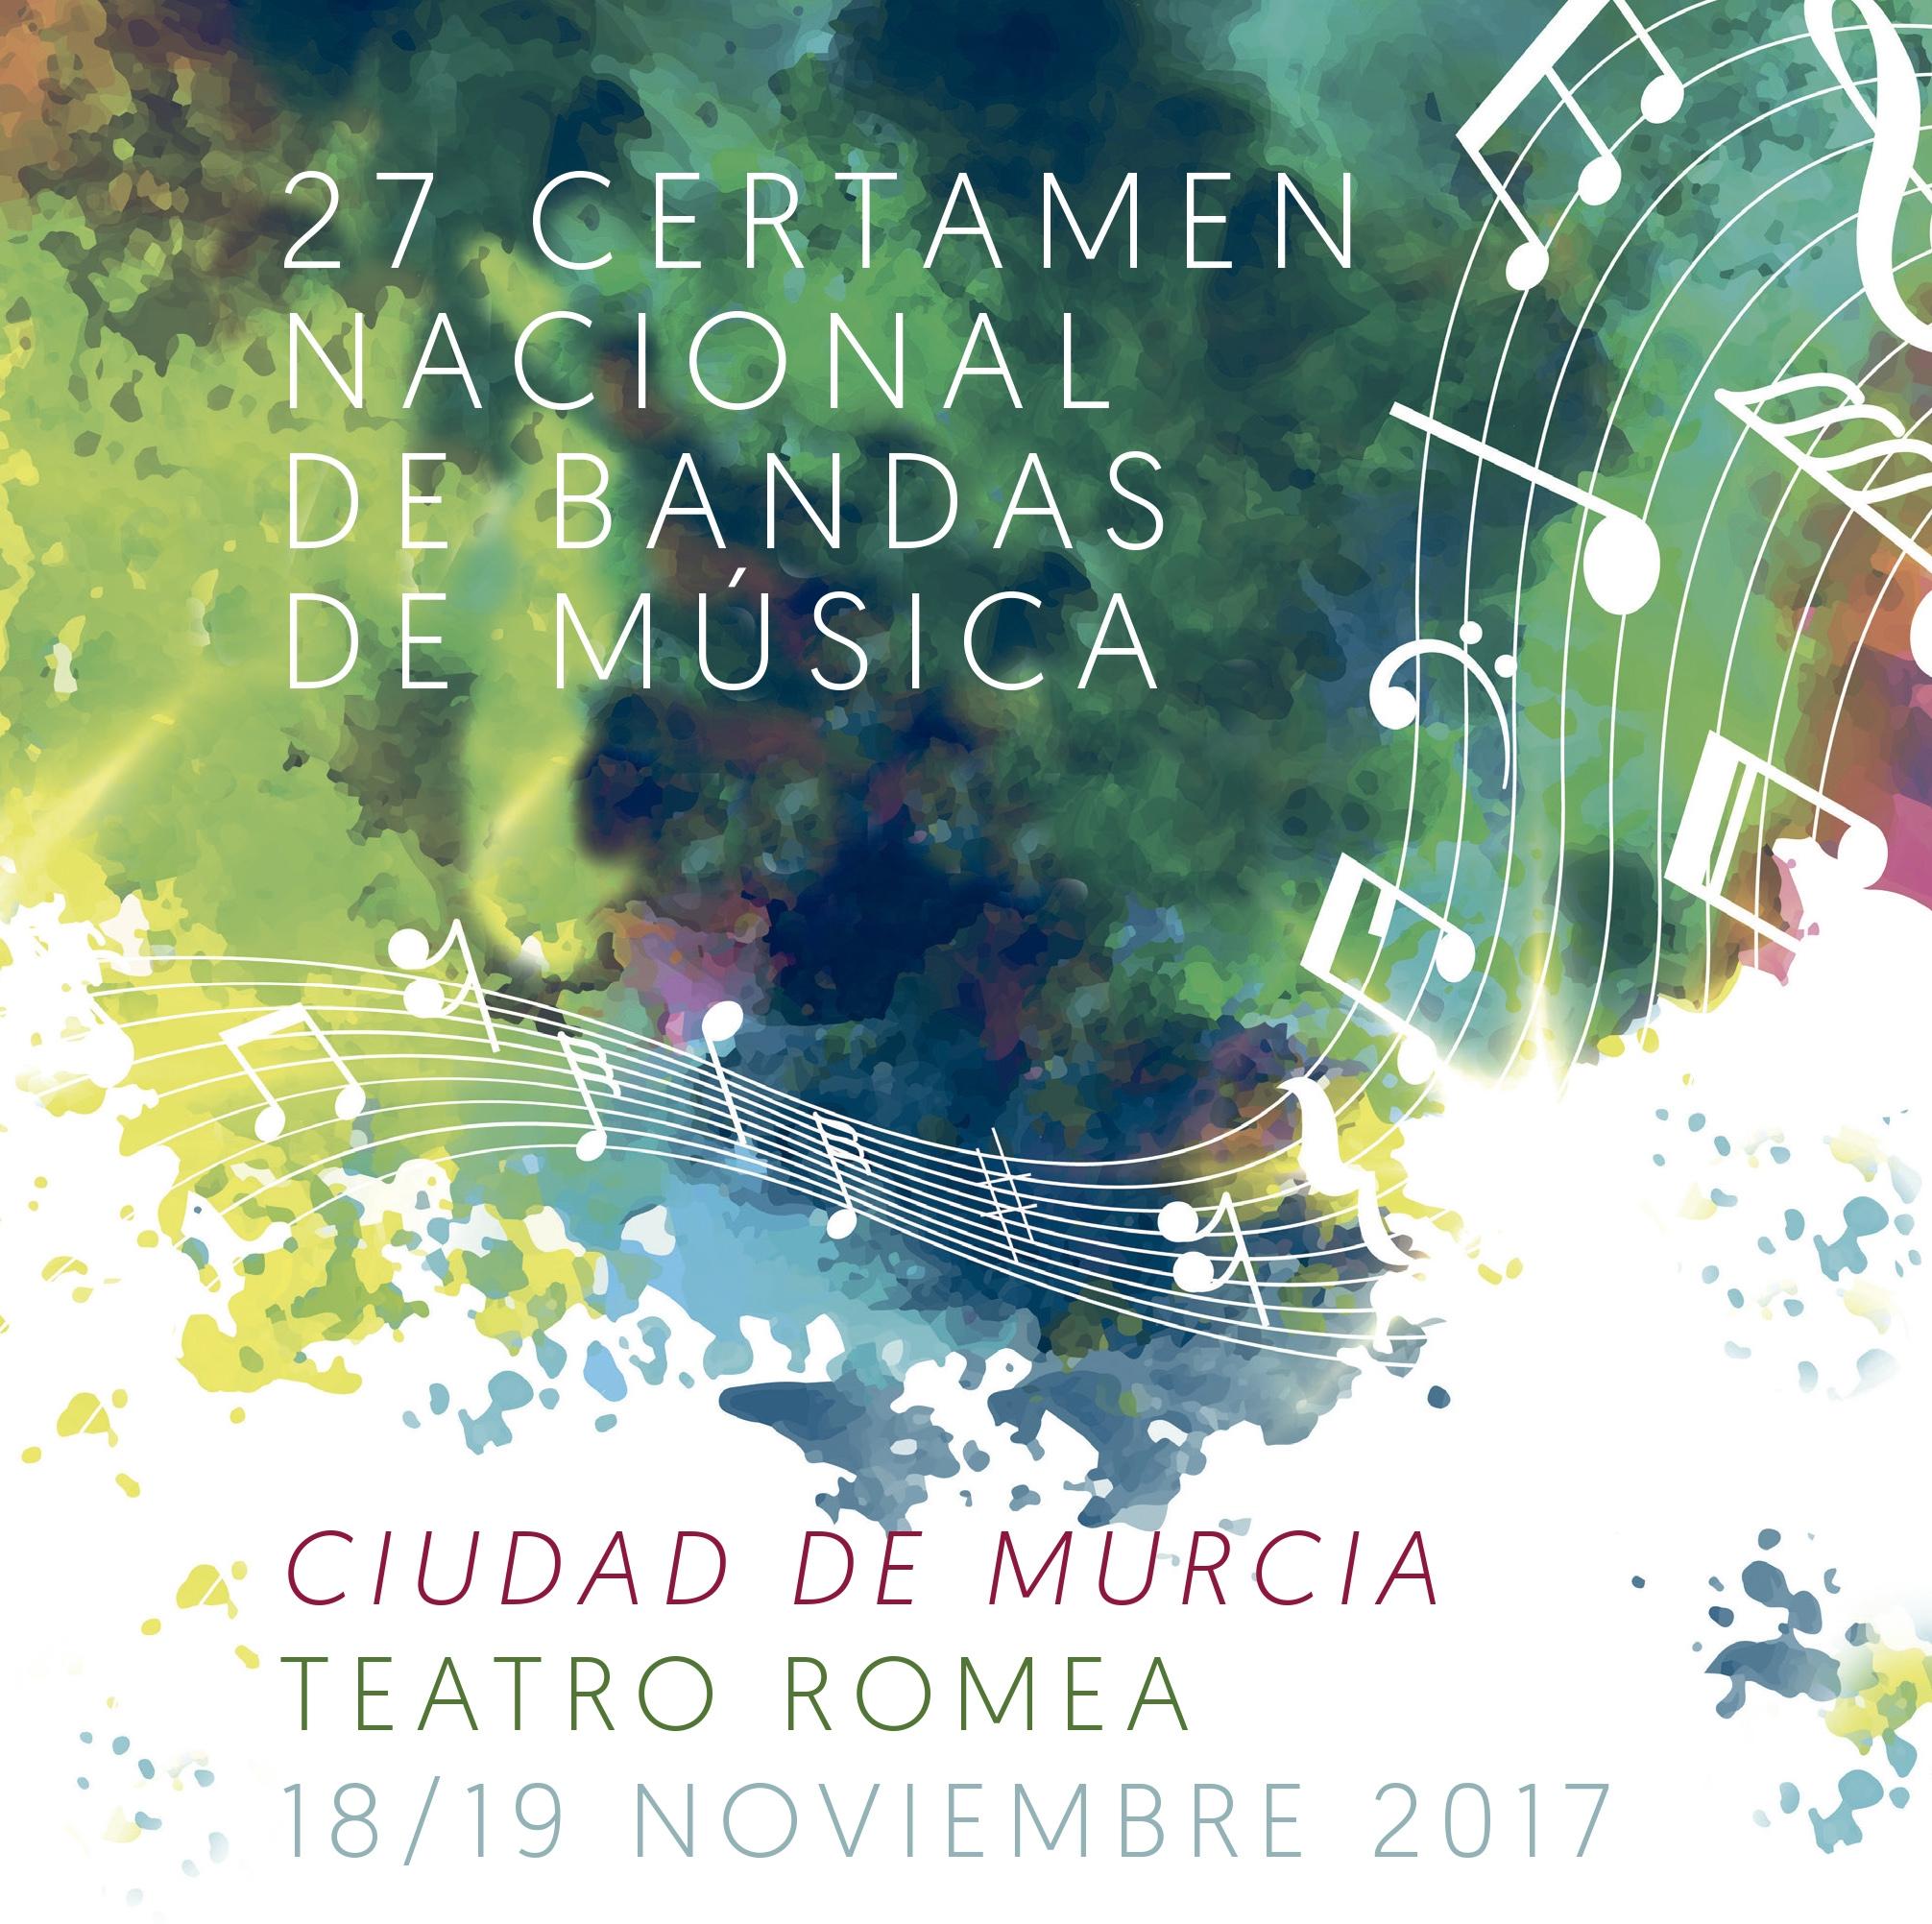 27 Certamen Nacional de Bandas de Música 'Ciudad de Murcia'